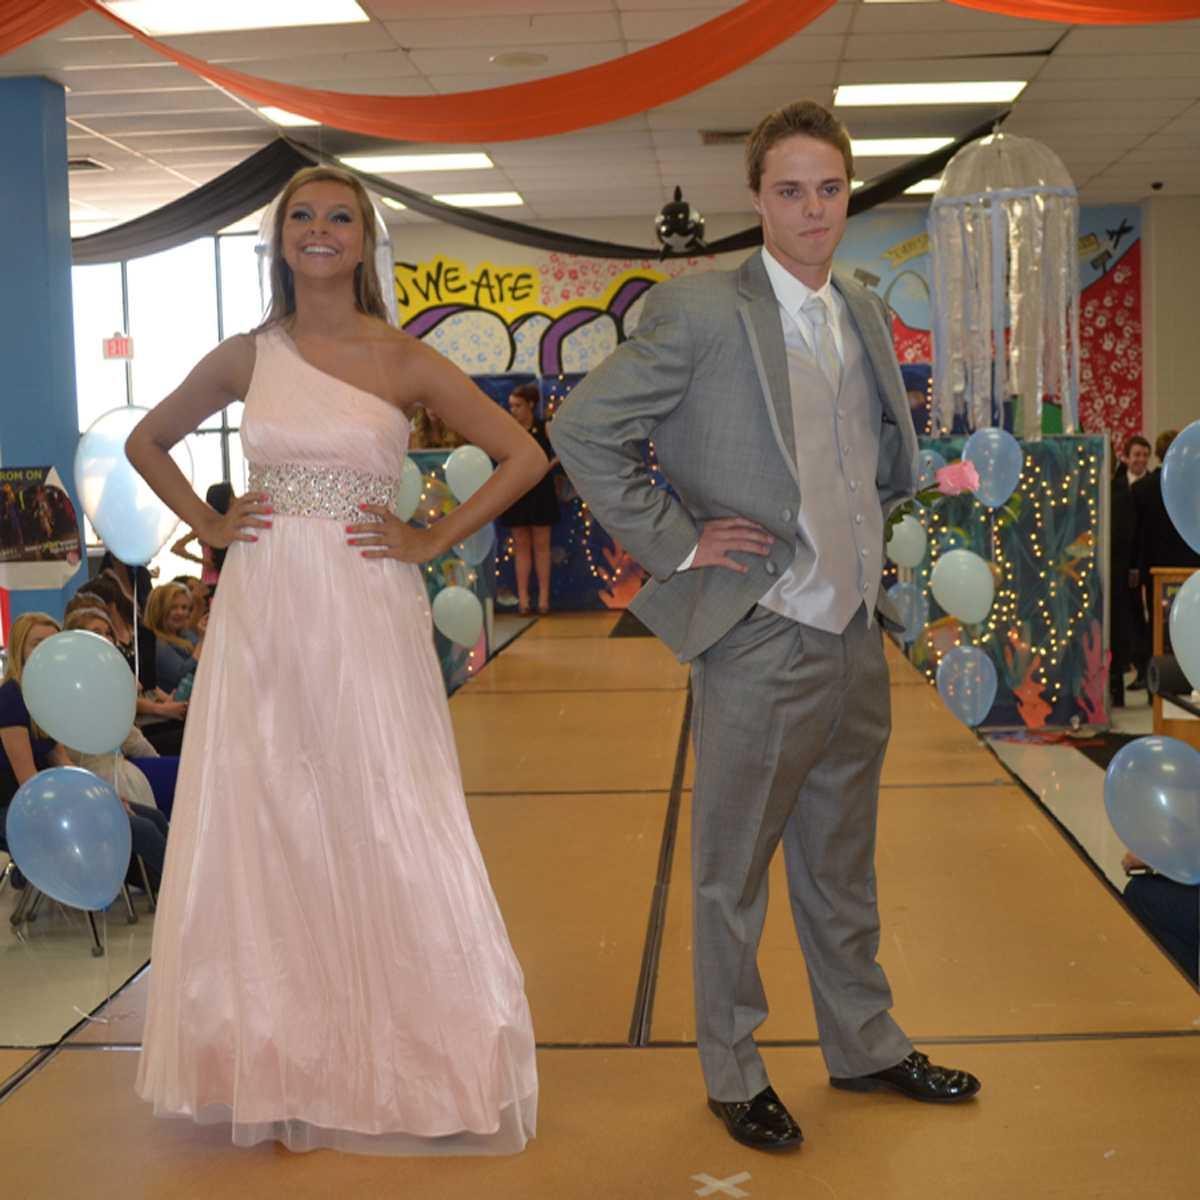 Seniors Kelly Popelar and Ryan Demuri pose together at the fashion show.